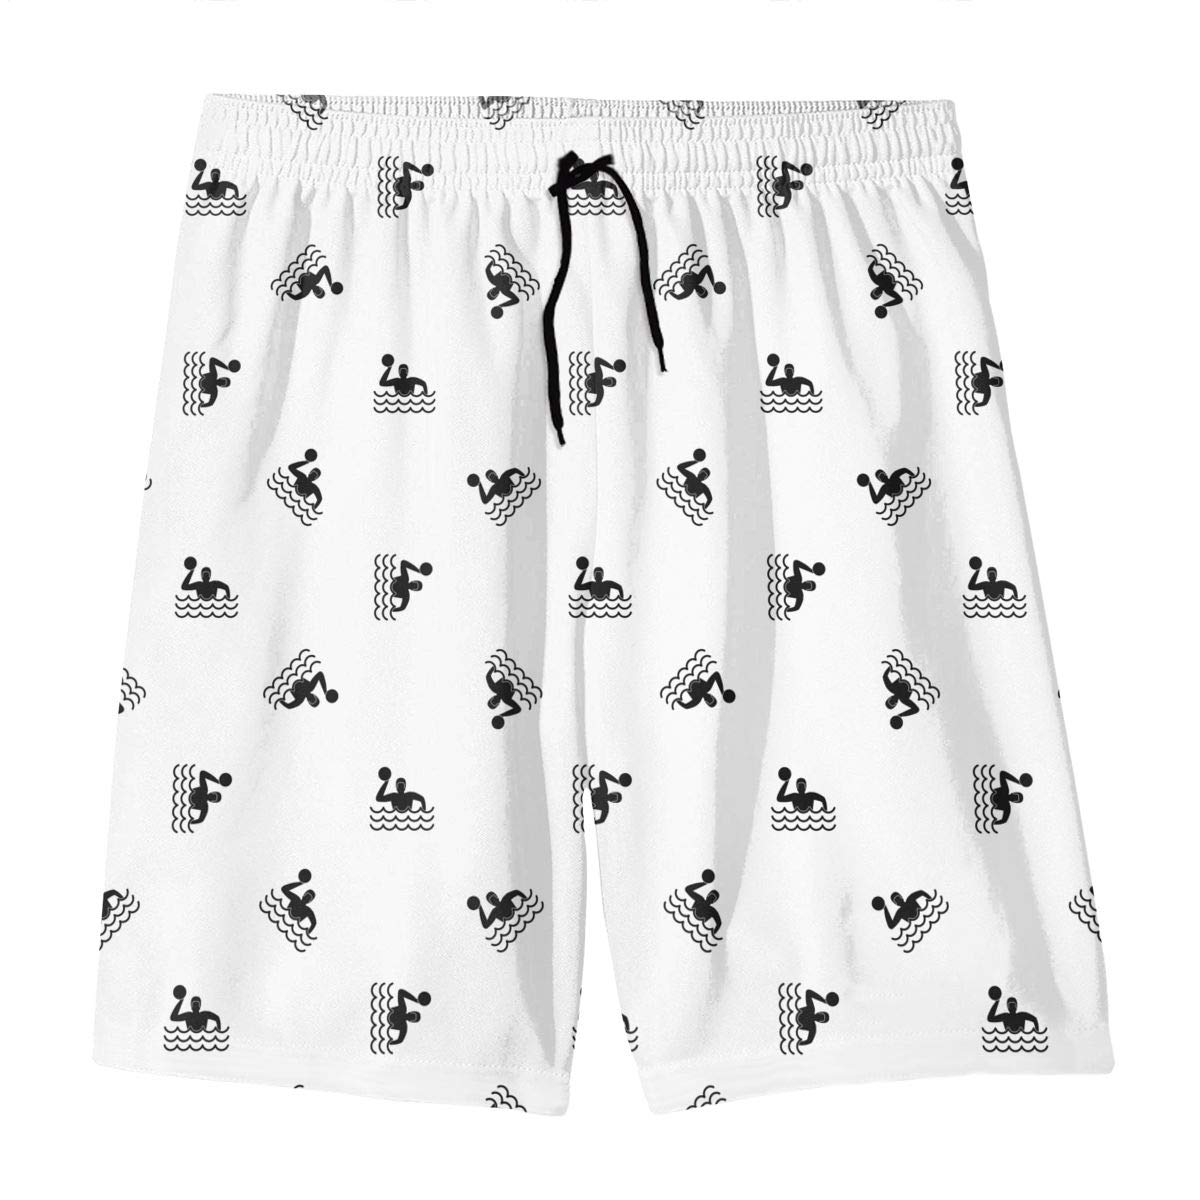 Polyester Water Polo Pattern Beachwear with Pockets GI80@KU Teen Athletic Swim Trunks